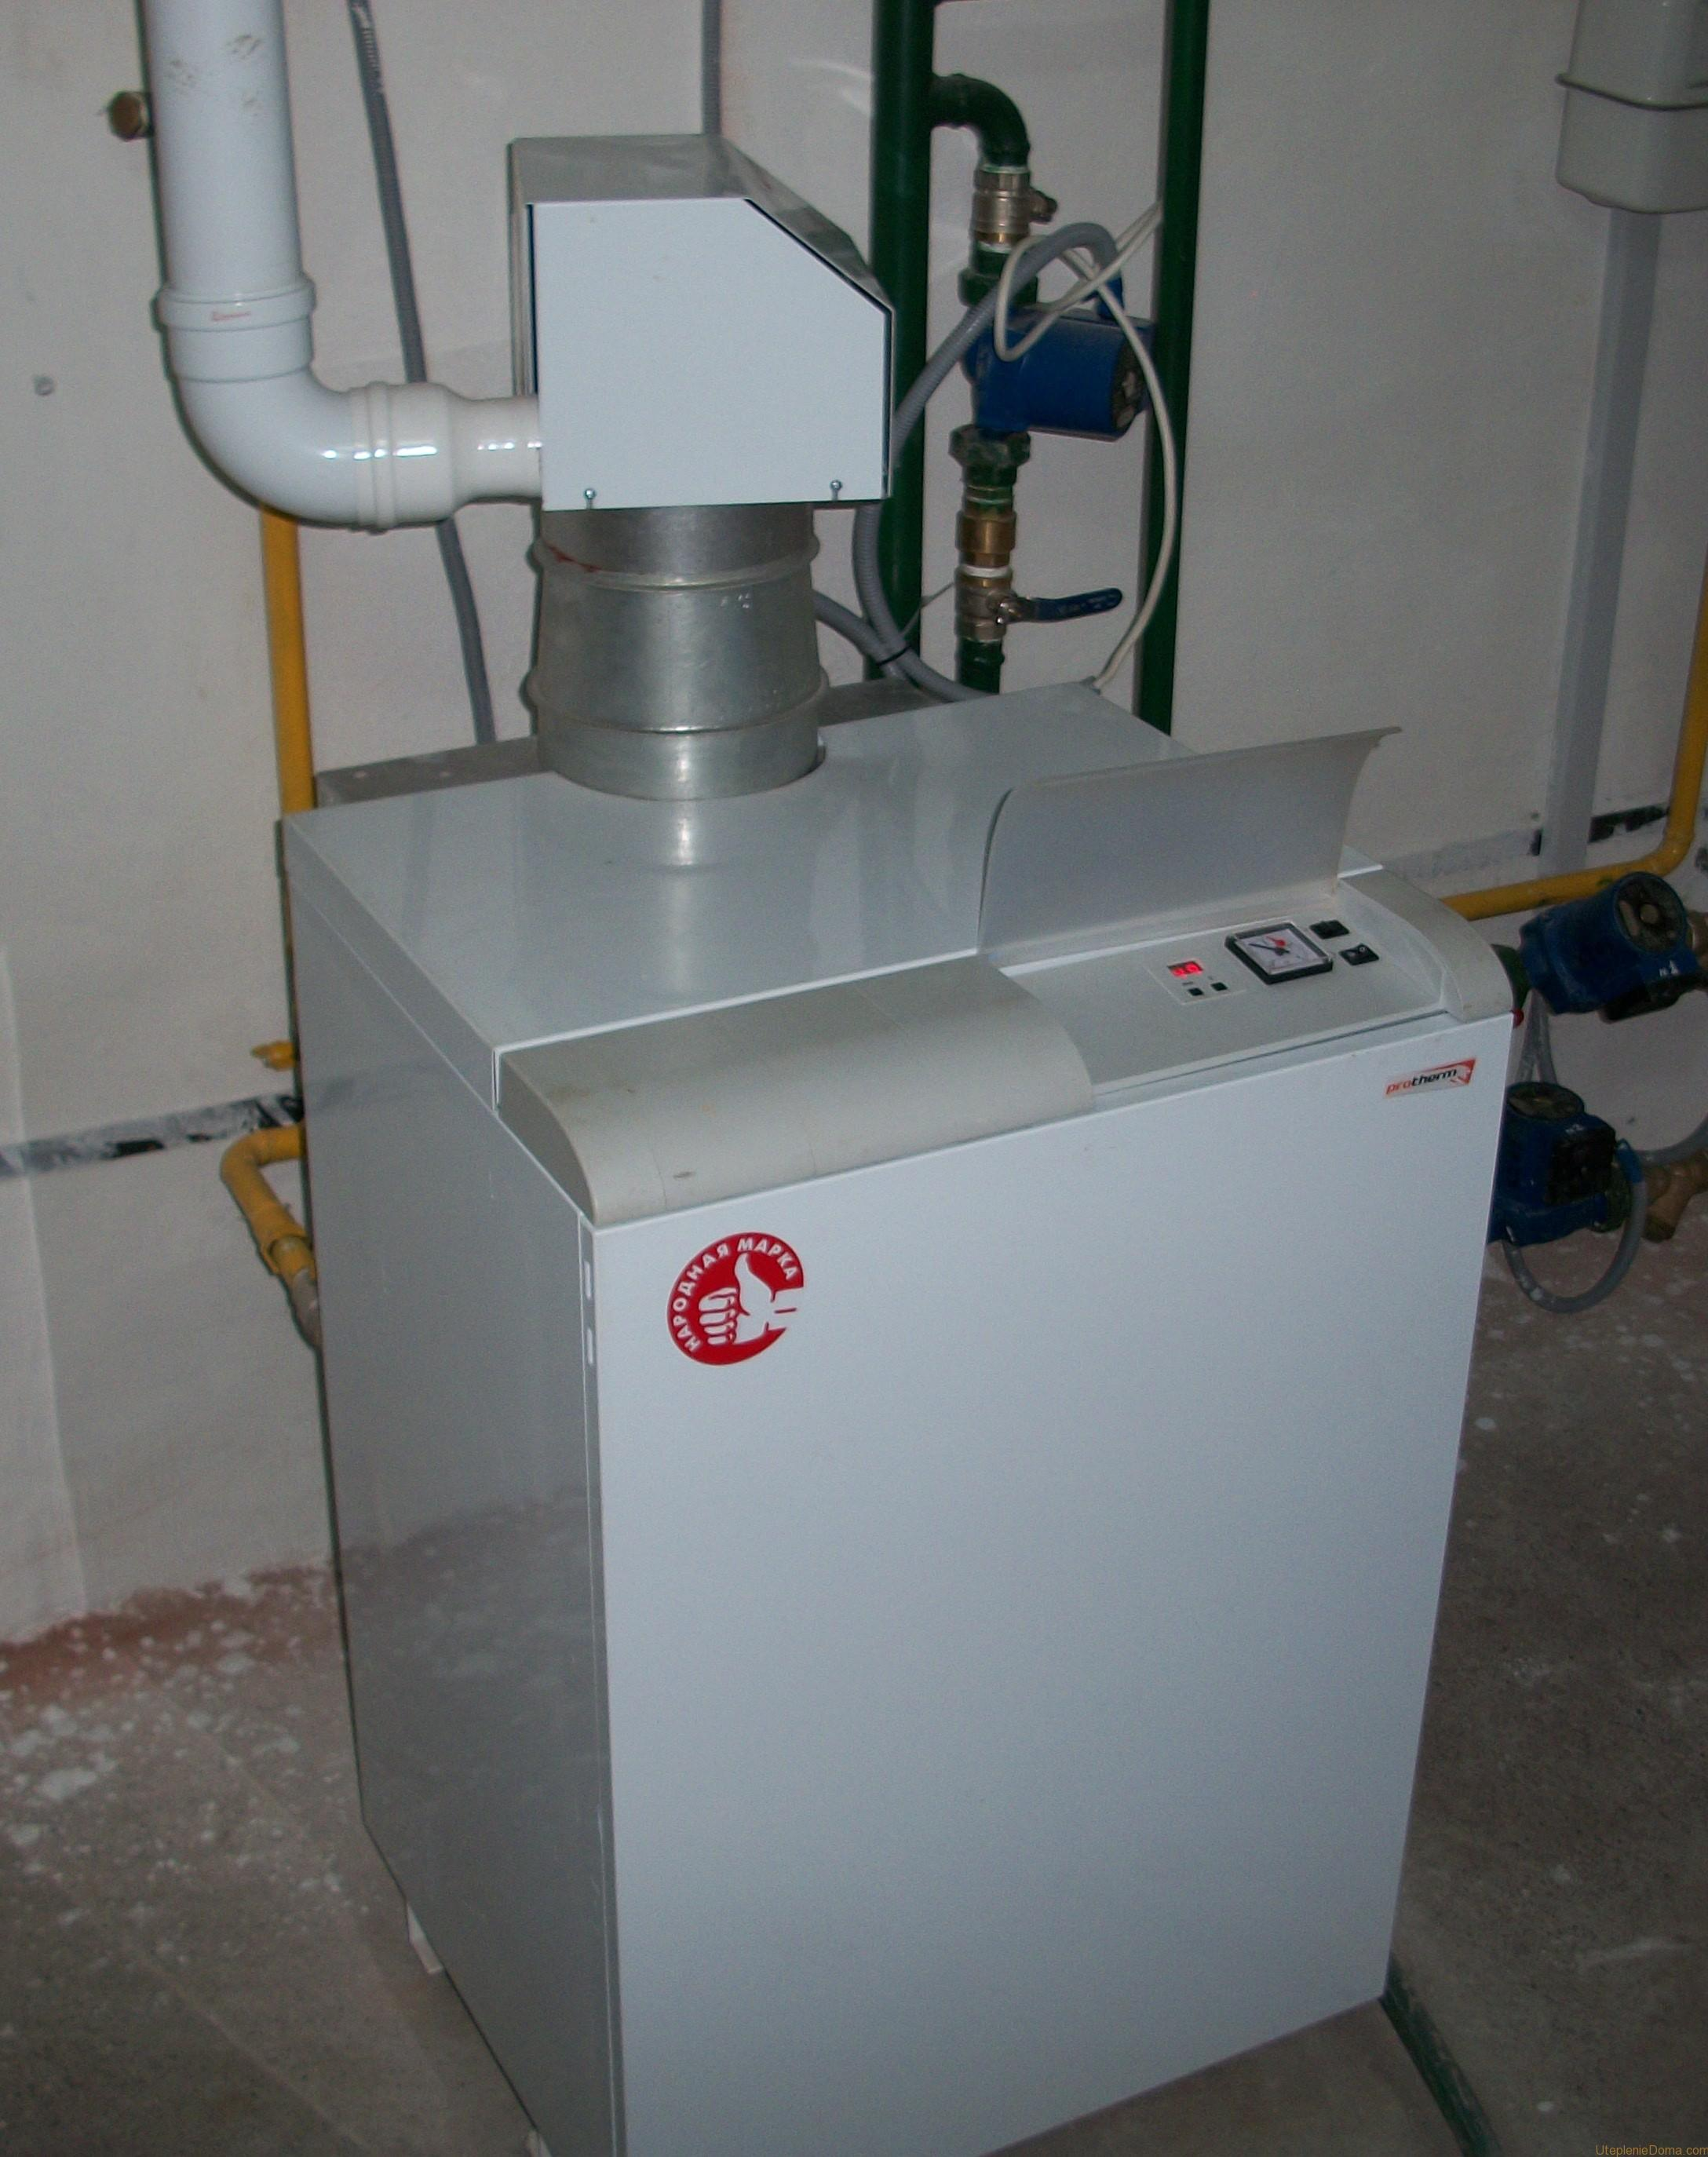 Chaudiere ideal standard creatis renovation travaux - Ideal standard chaudiere ...